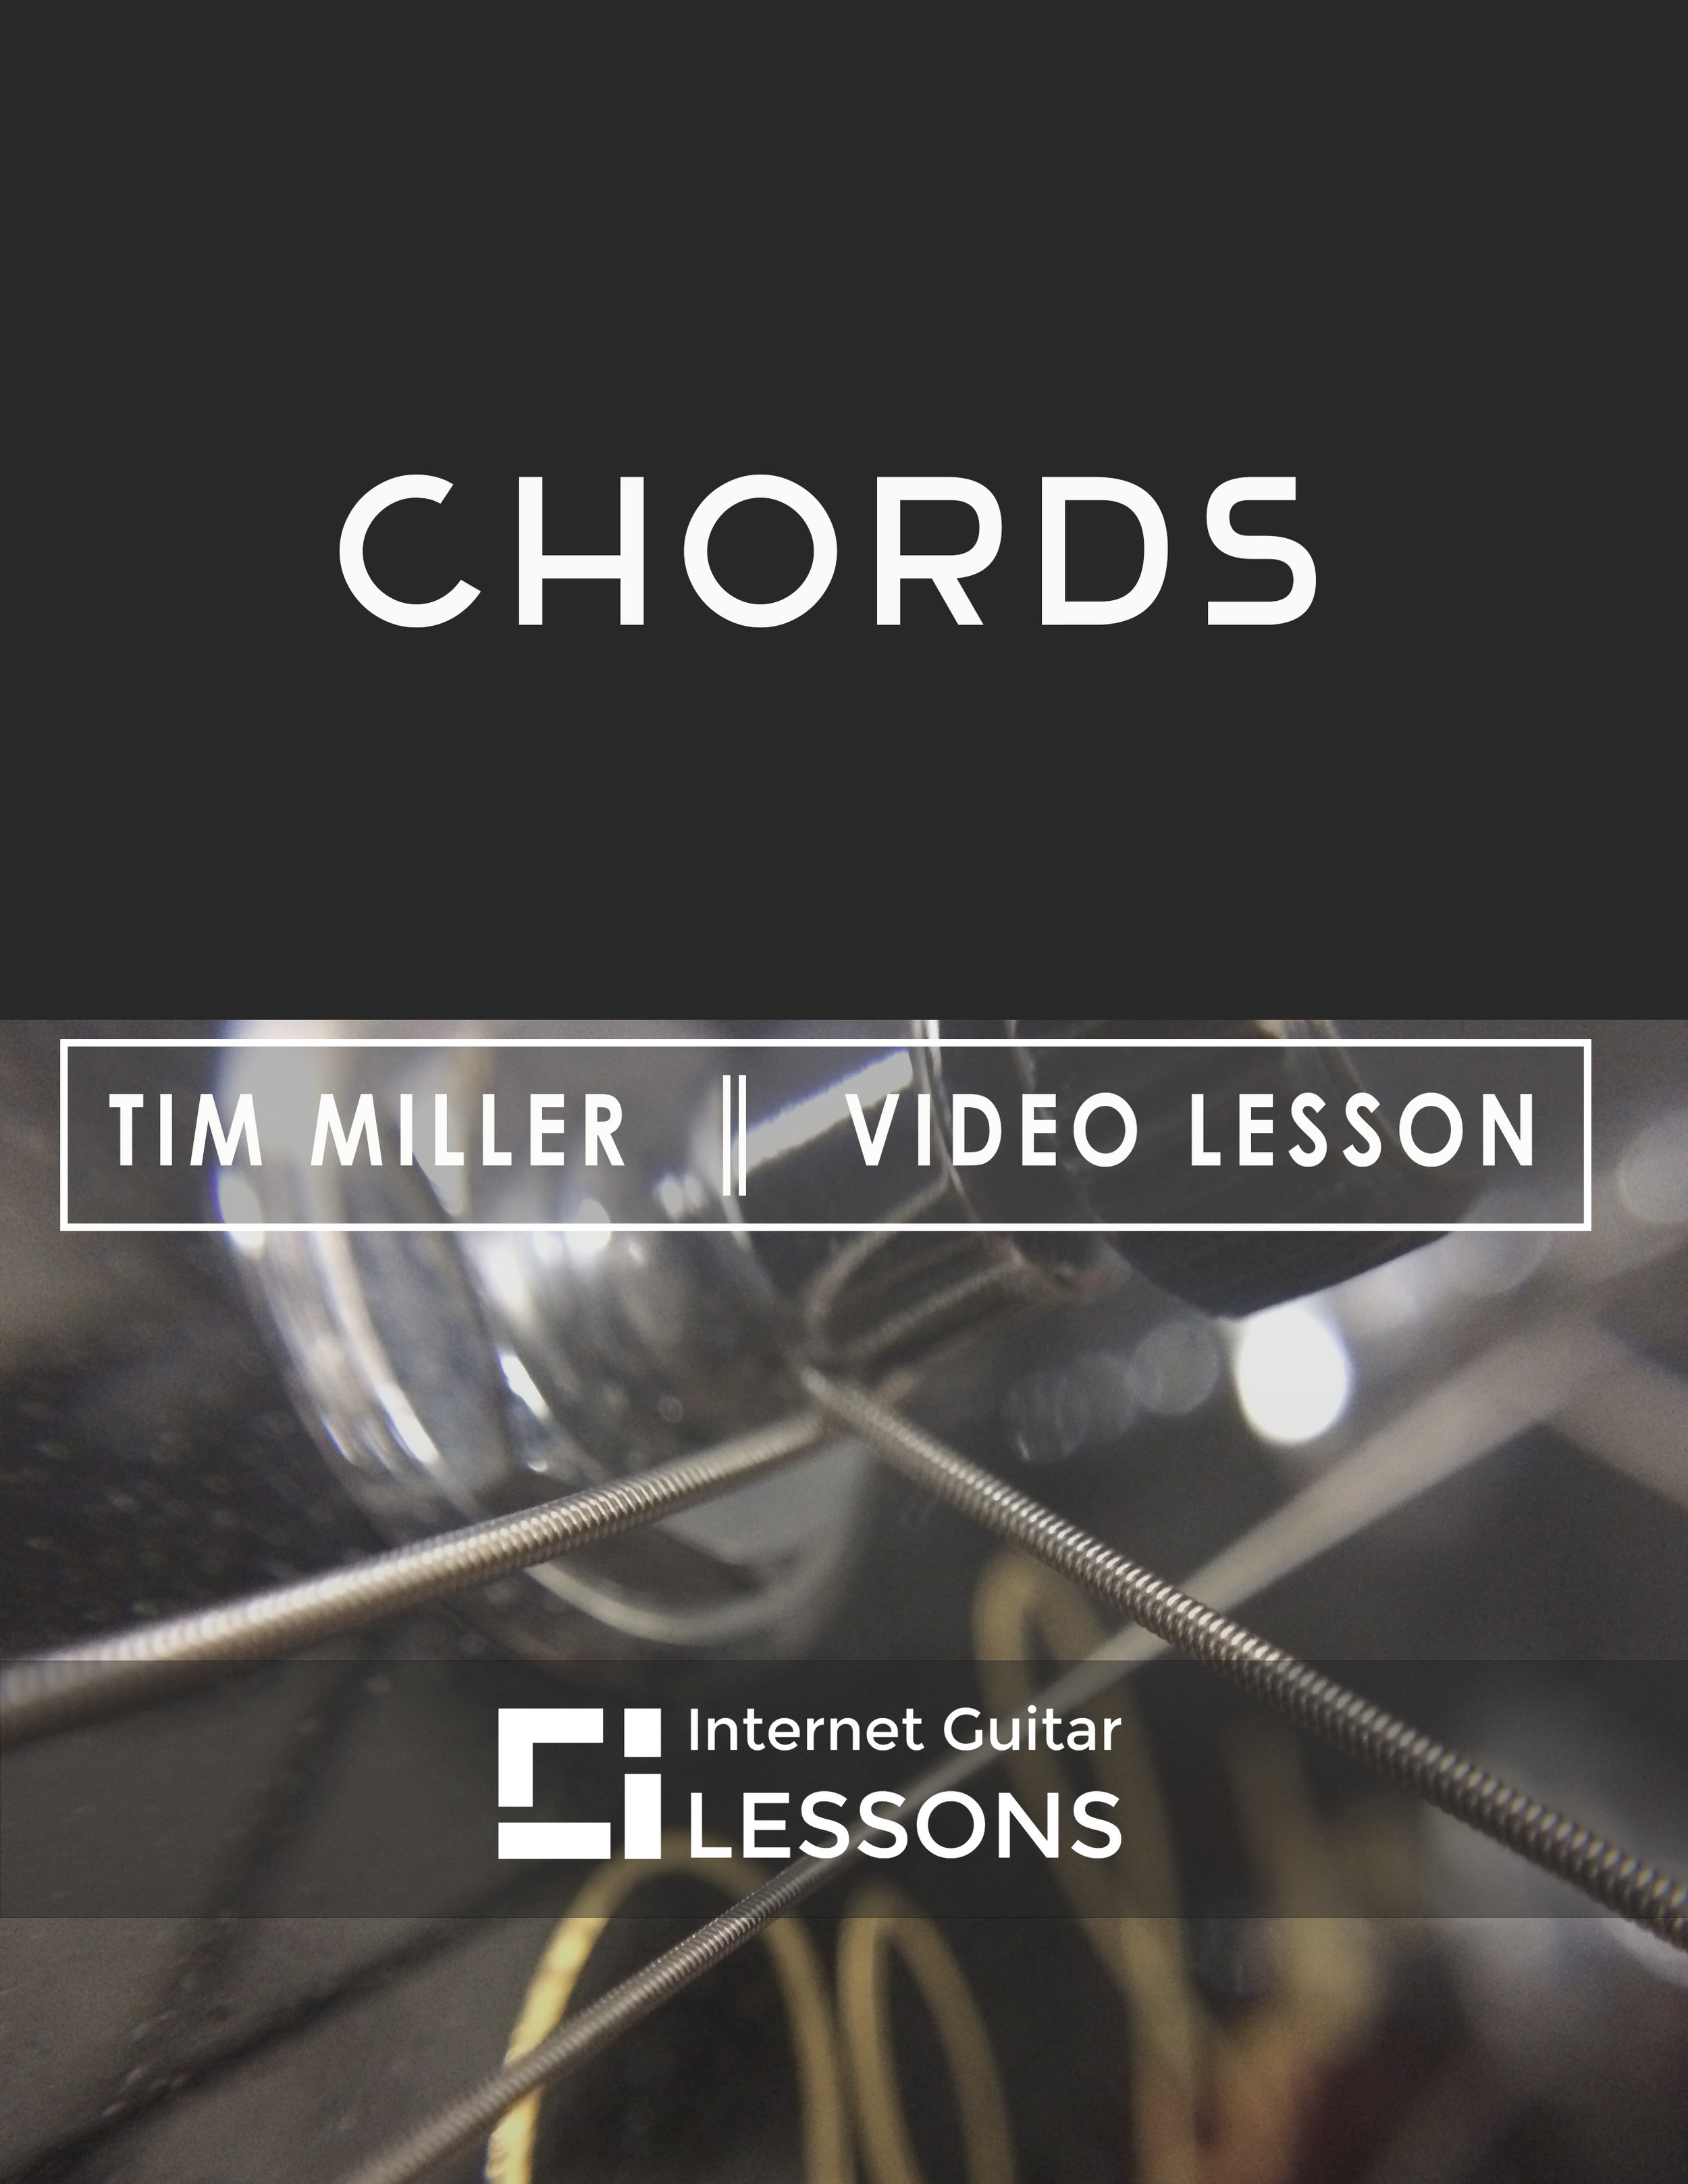 Chords 1.17 flat.jpg